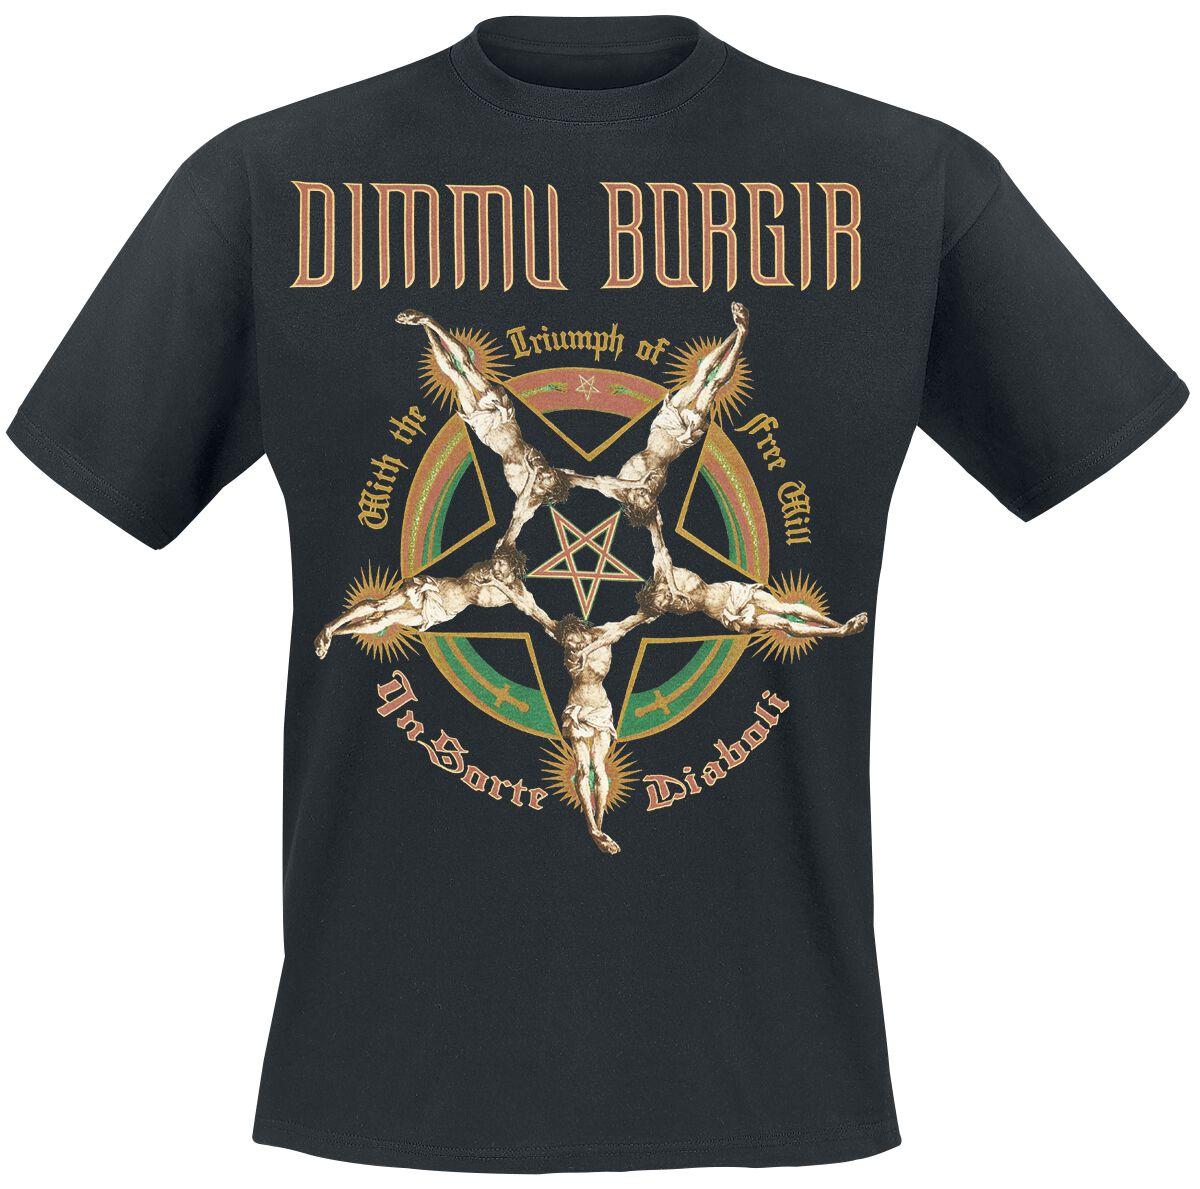 Zespoły - Koszulki - T-Shirt Dimmu Borgir Free Will T-Shirt czarny - 363555